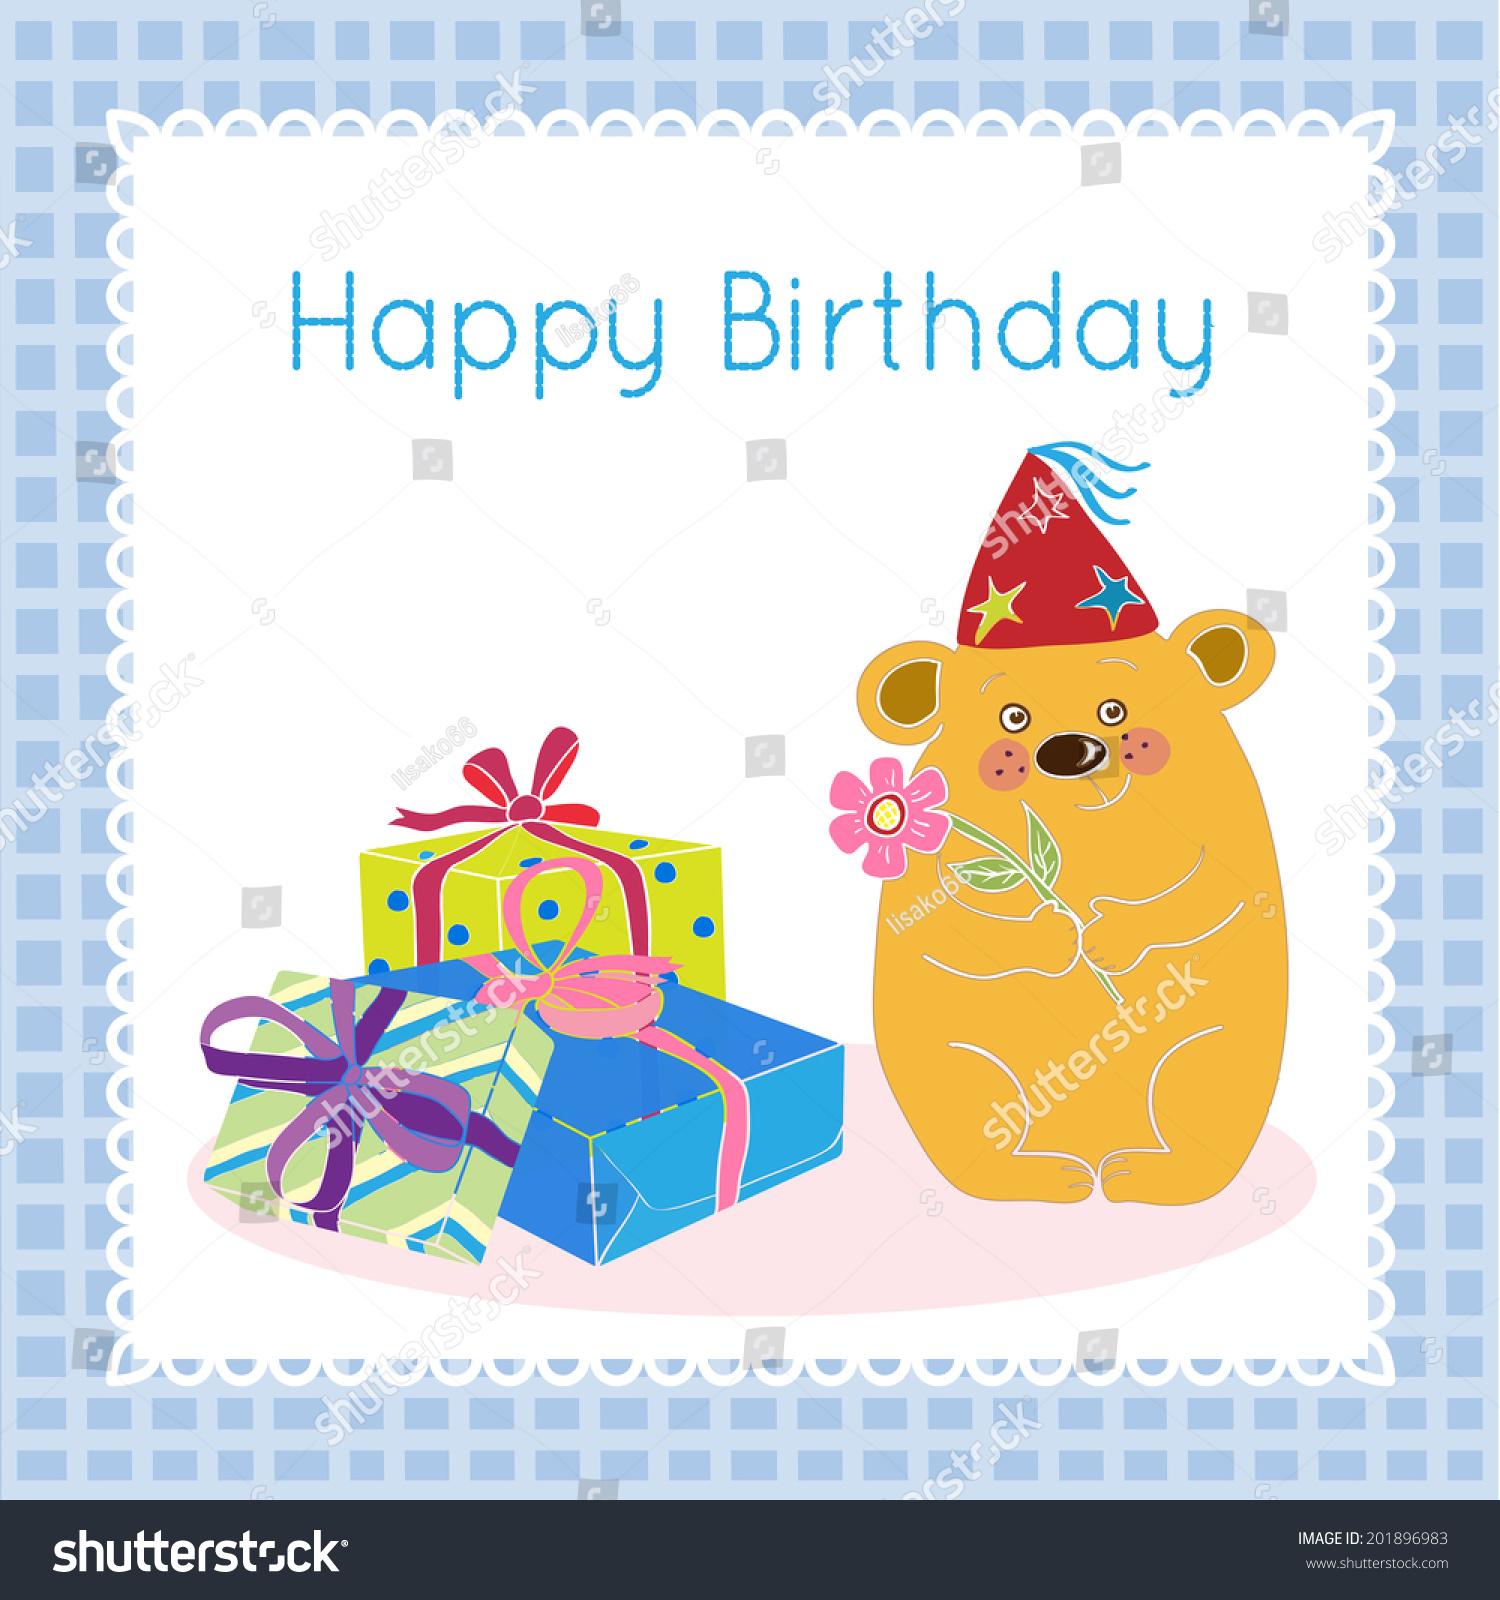 Happy birthday greetings kids stock vector 201896983 shutterstock kristyandbryce Gallery